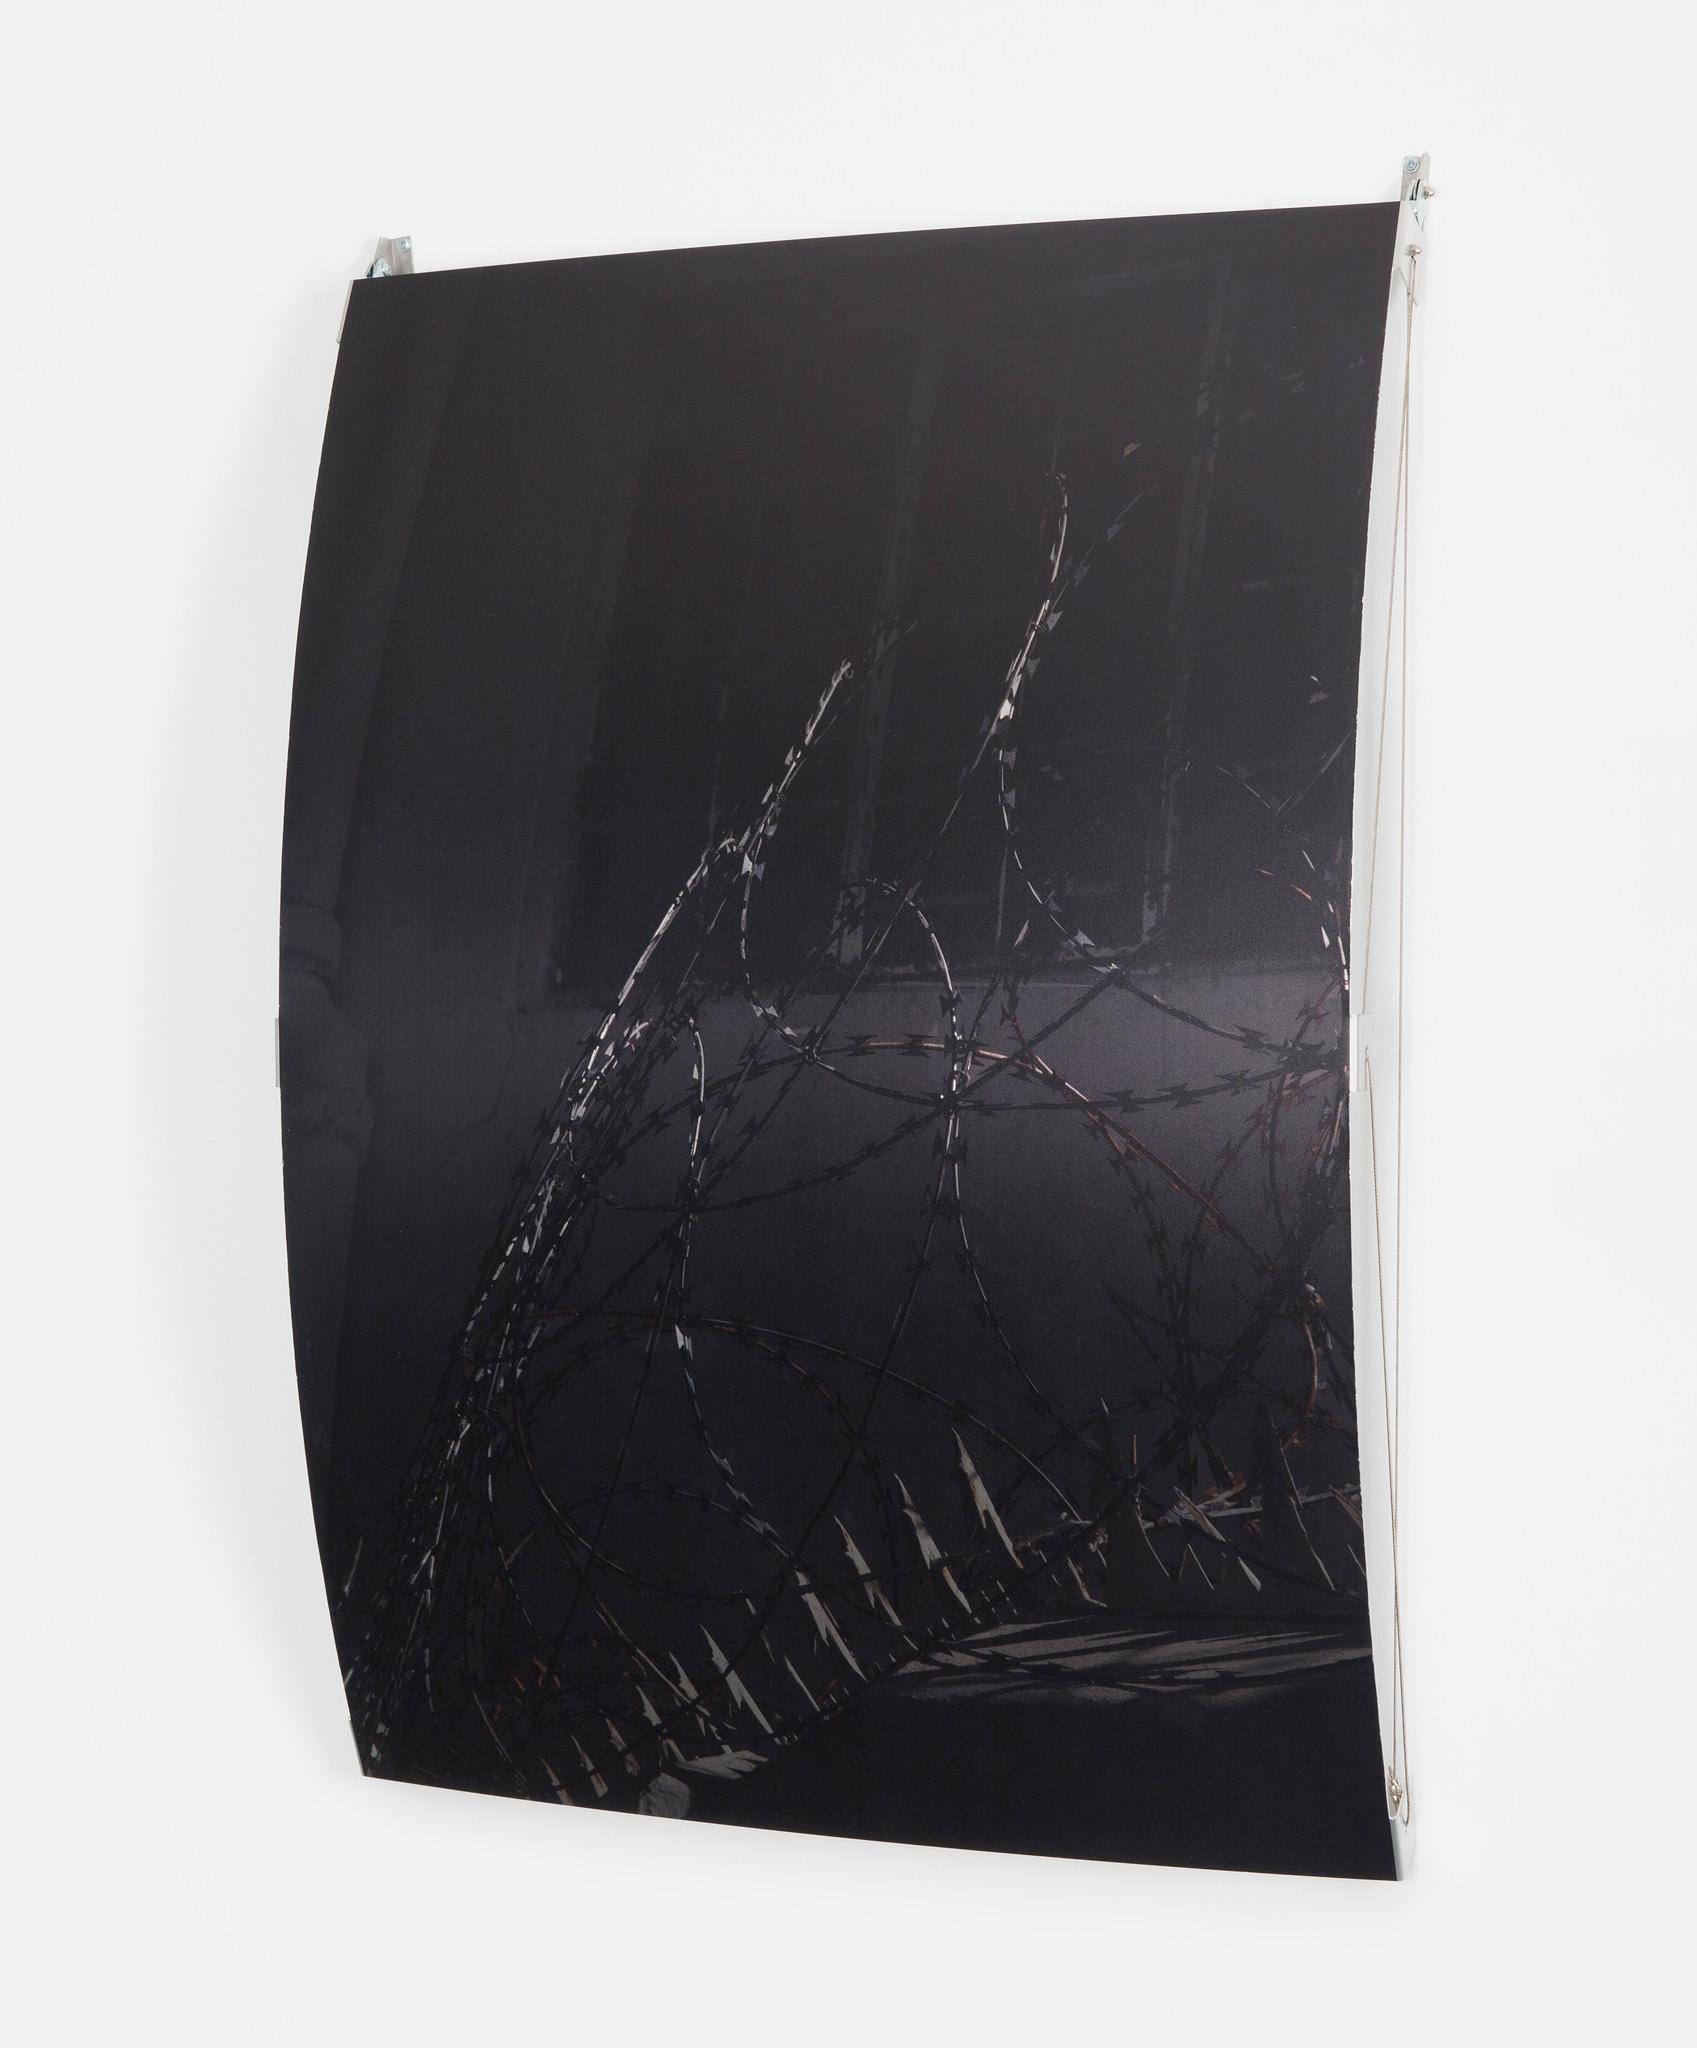 <p><i>FOLD</i> - Tensioner, 2020. UV Pigment Print on Mechanically Folded Aluminum Plate w 3mm Metal Rope, 1150mm x 800mm x 180mm.</p>